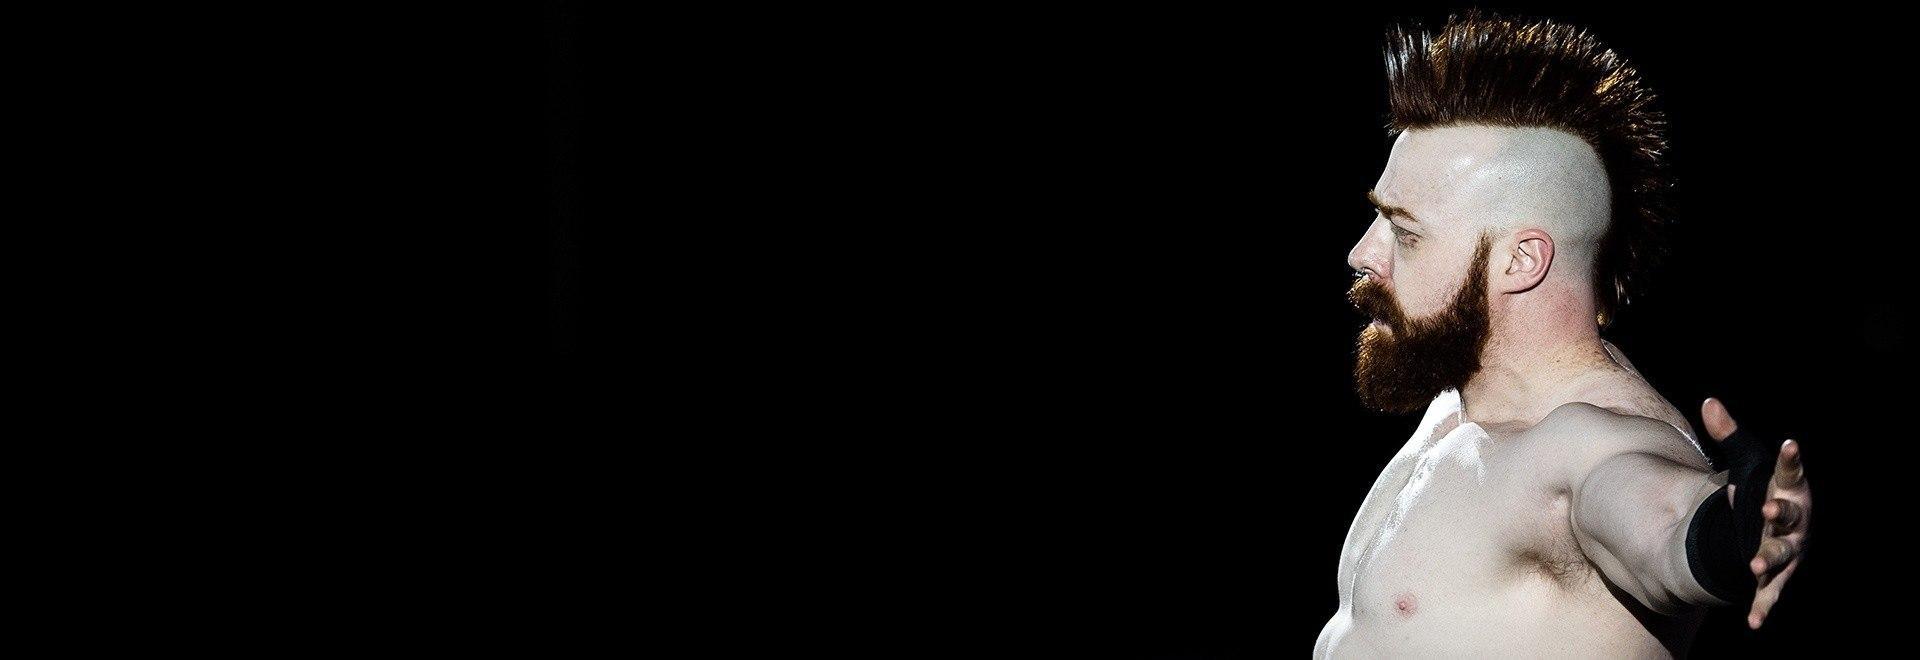 Ep. 240